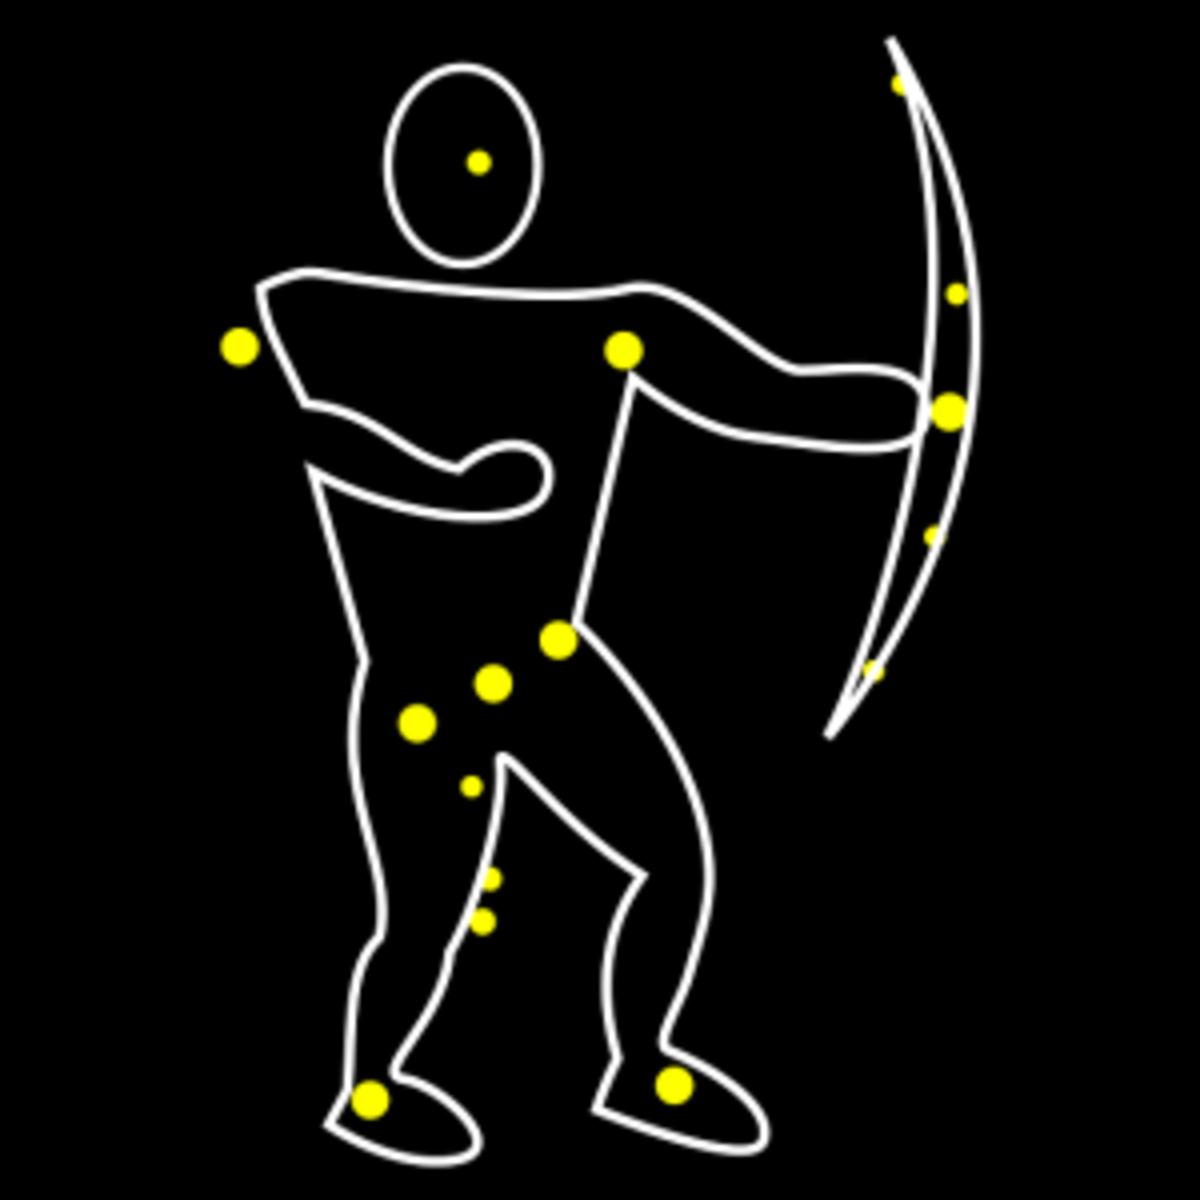 constellation dot to dot